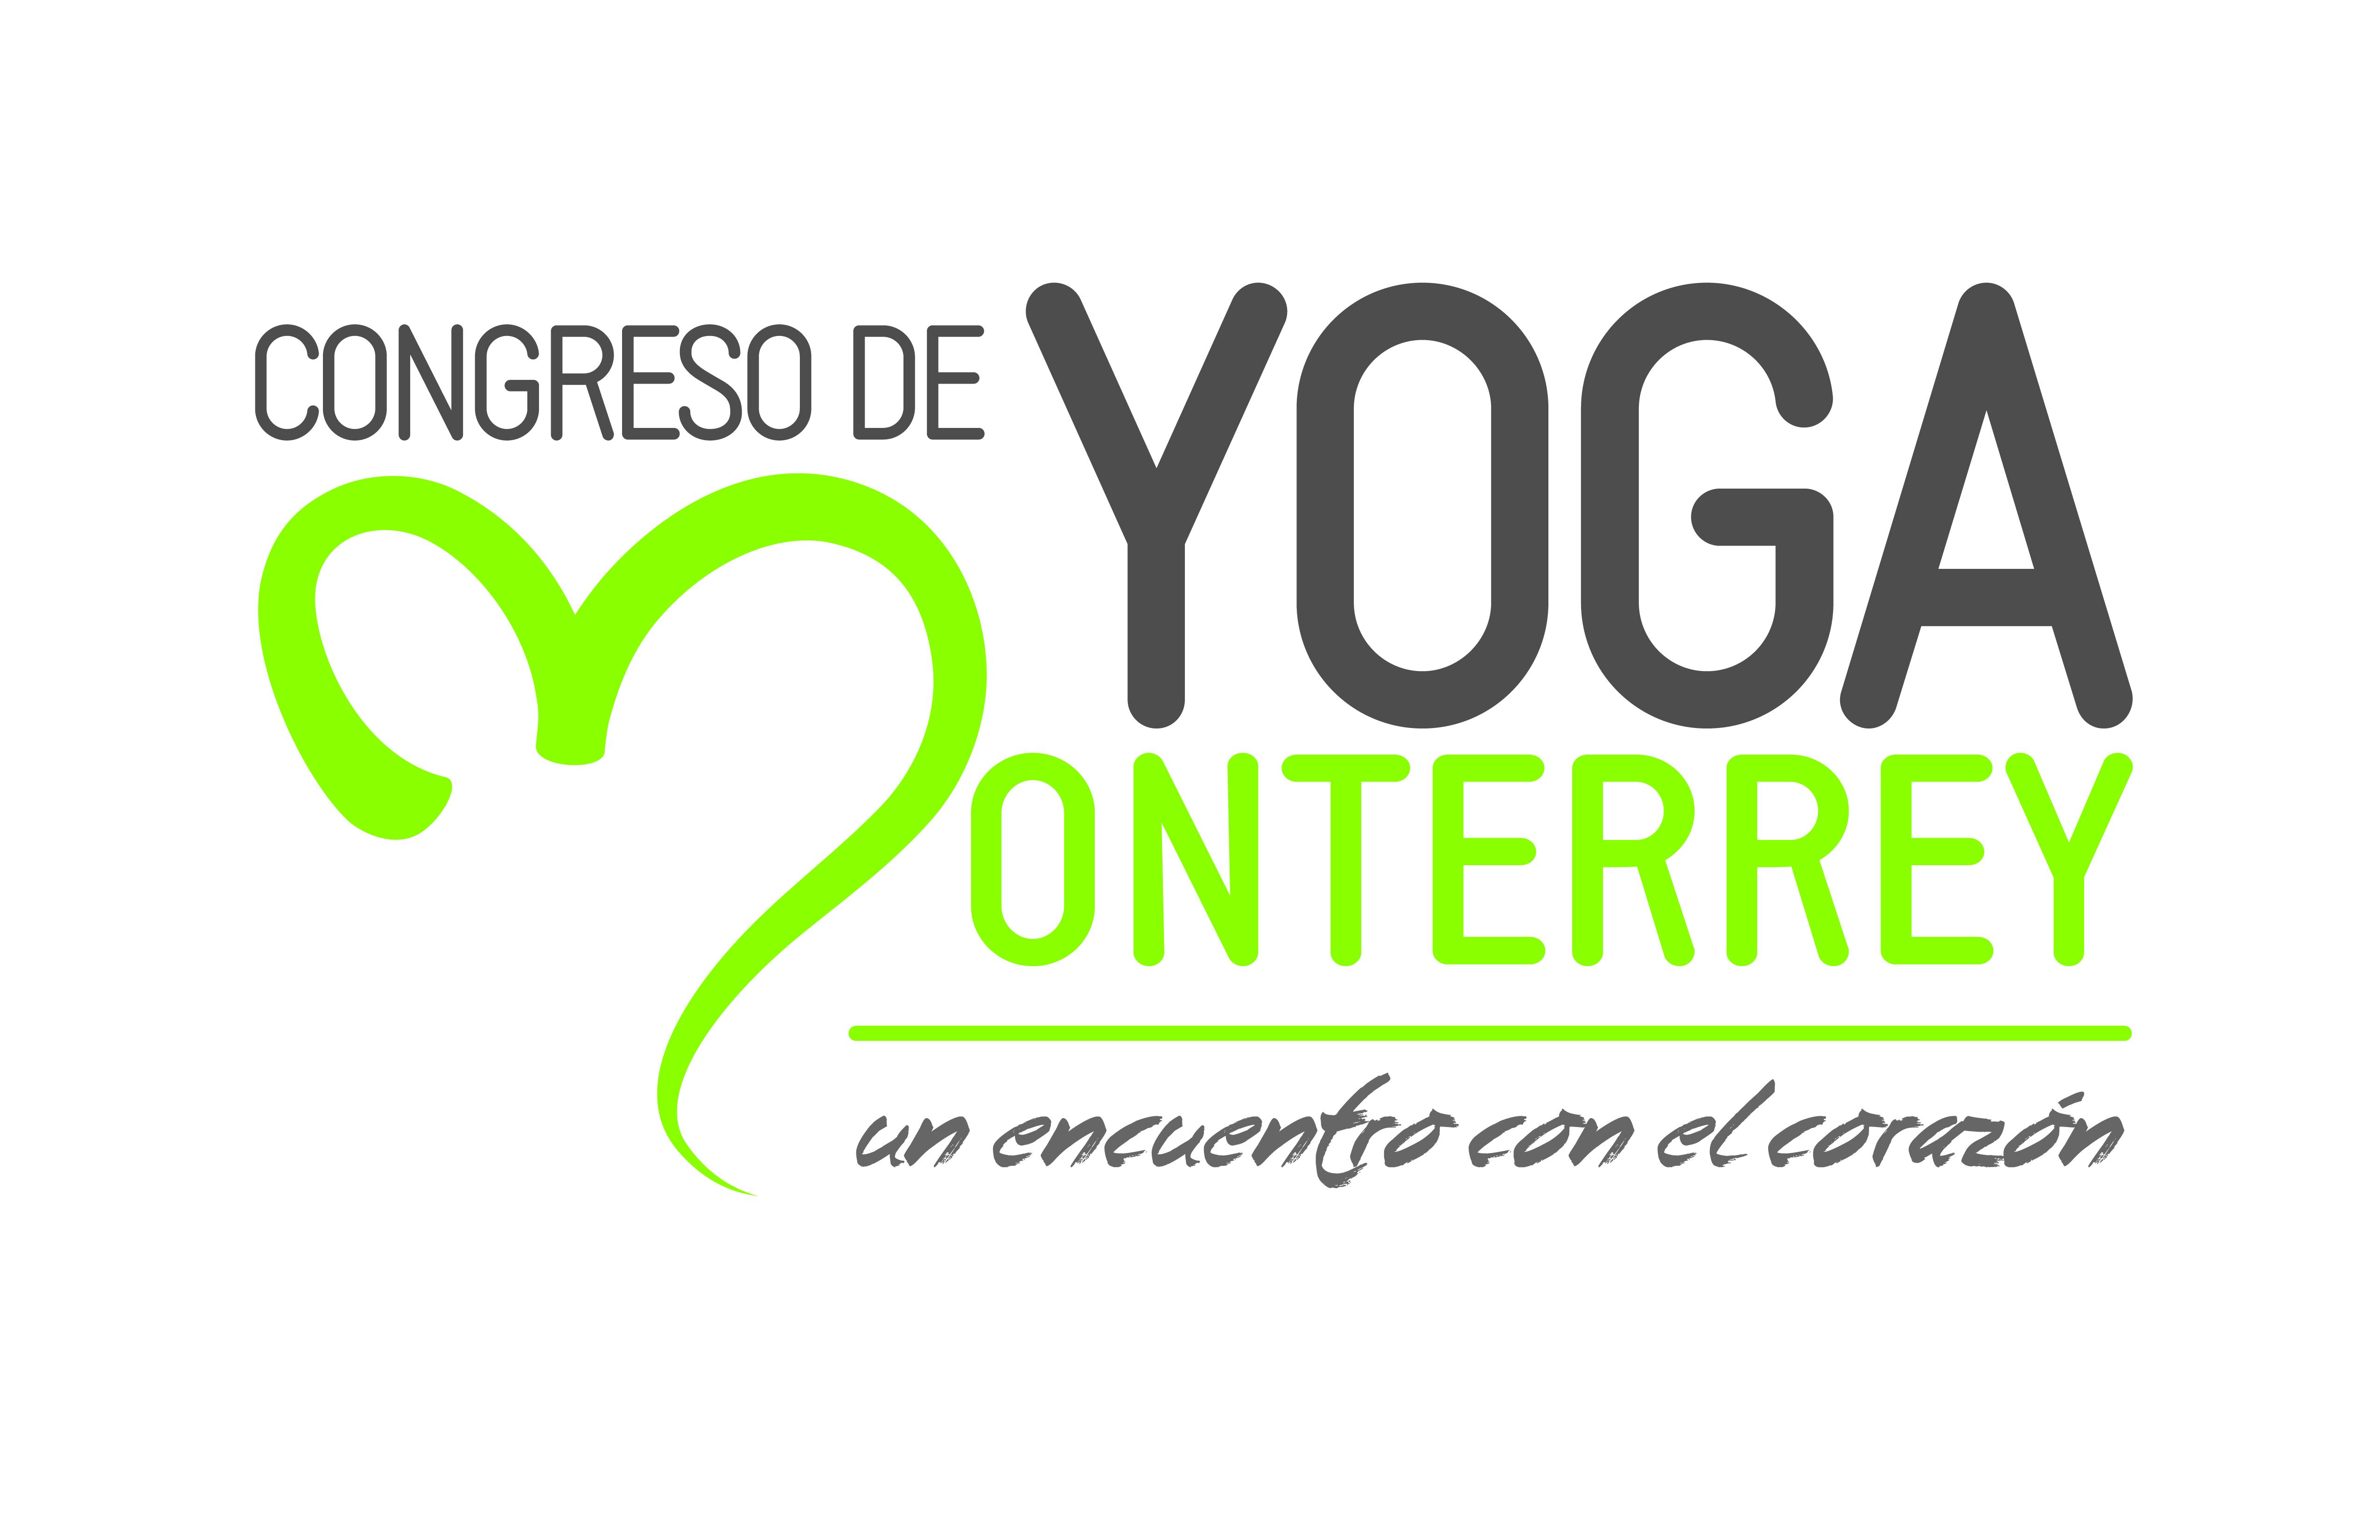 events archive parayoga rod stryker at the congreso de yoga monterrey